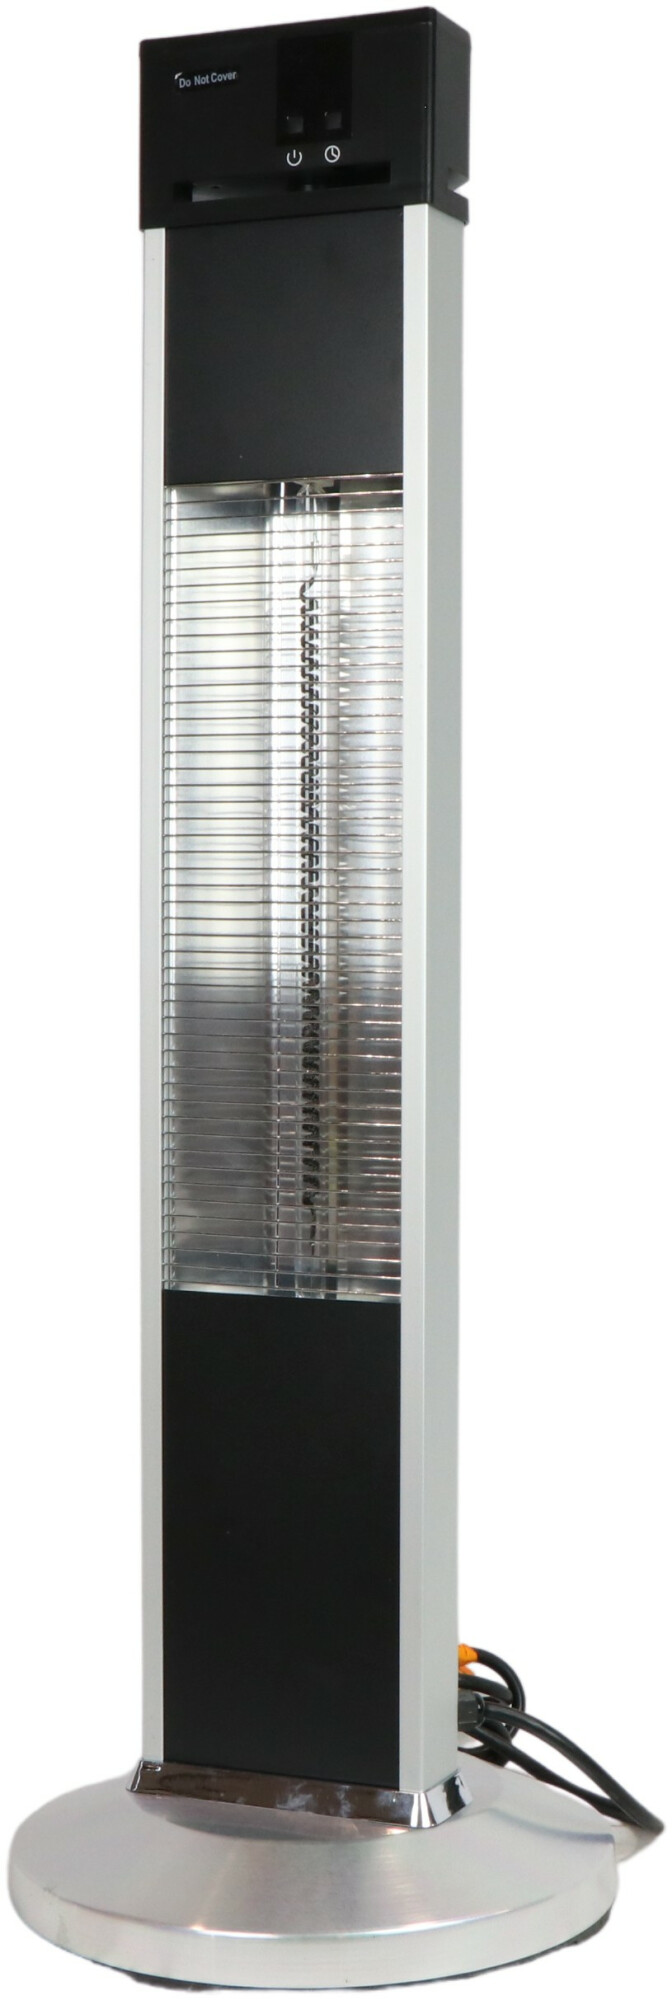 trustech portable patio heater heaters accessory pd15r